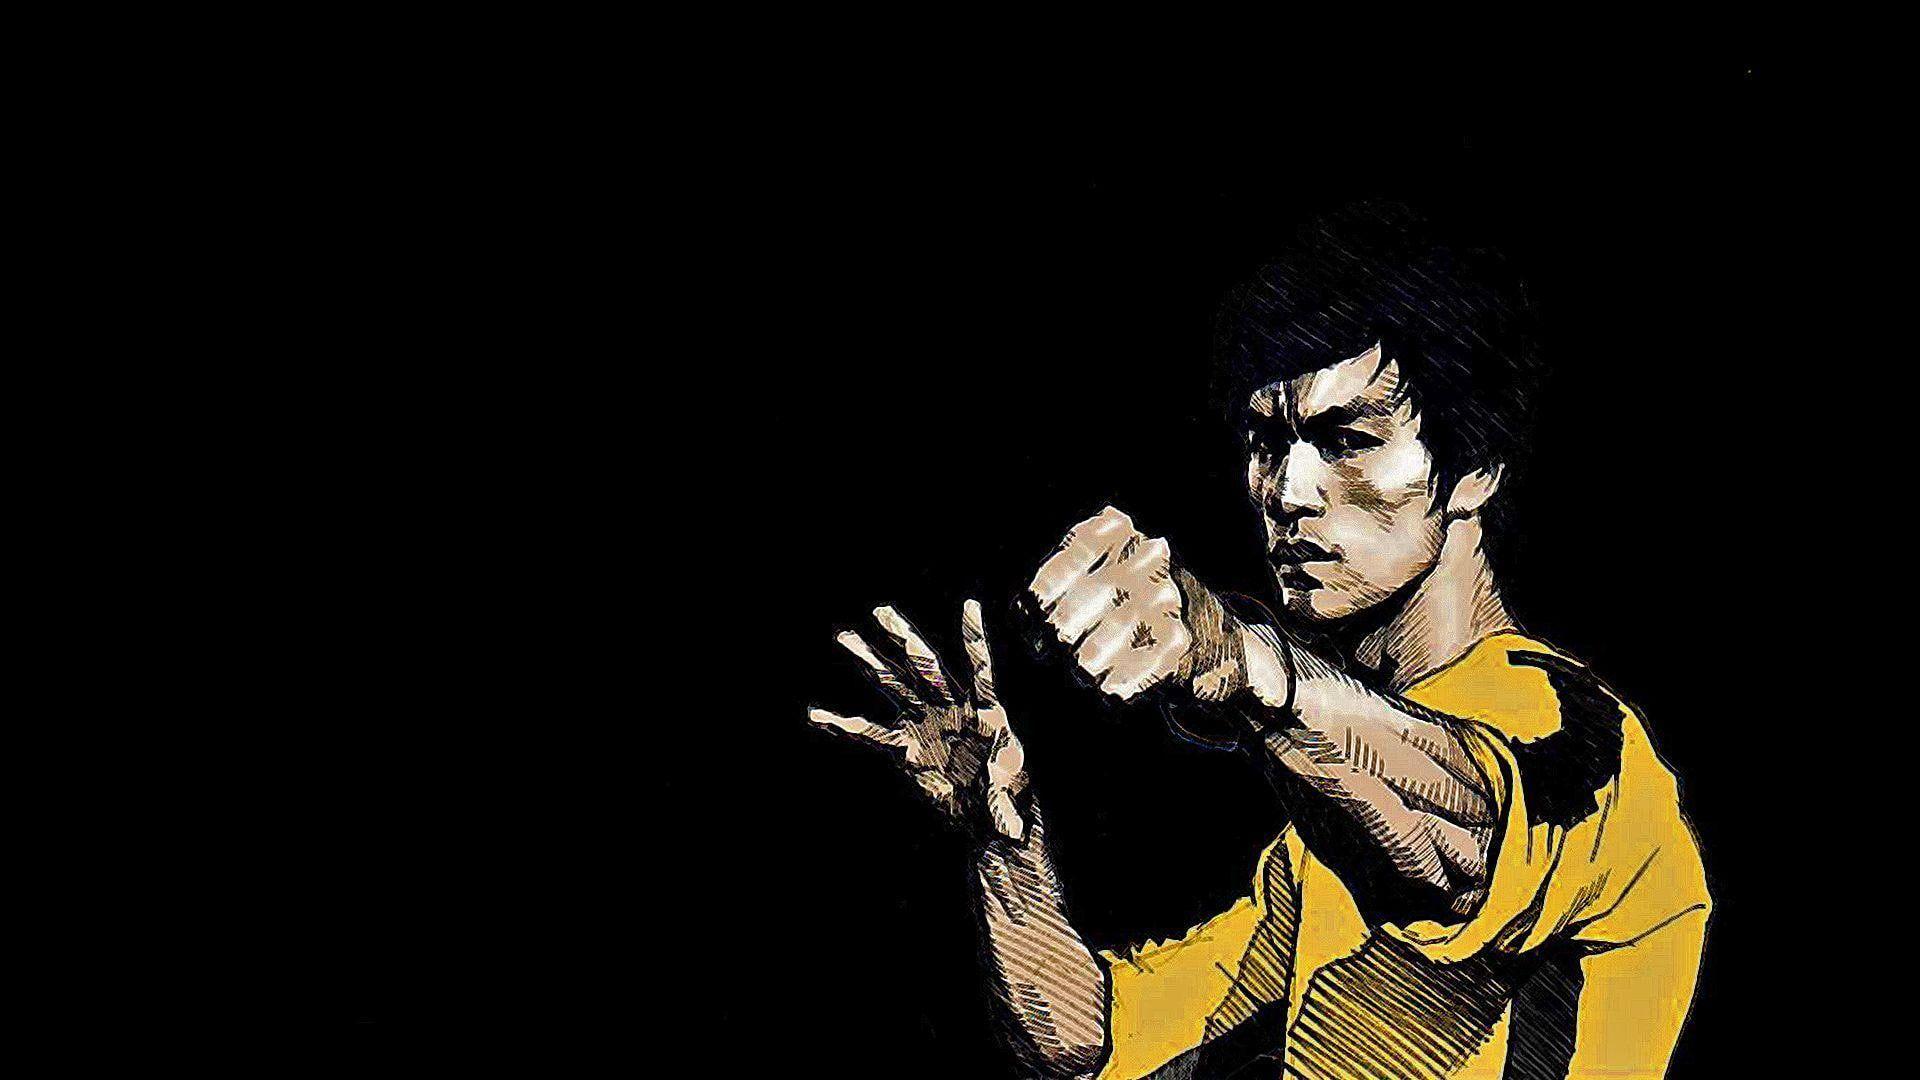 Bruce Lee Bruce Lee Male Celebrities 1920x1080 Bruce Lee 1080p Wallpaper Hdwallpaper Desktop Bruce Lee Bruce Lee Wallpapers Bruce Lee Wallpaper